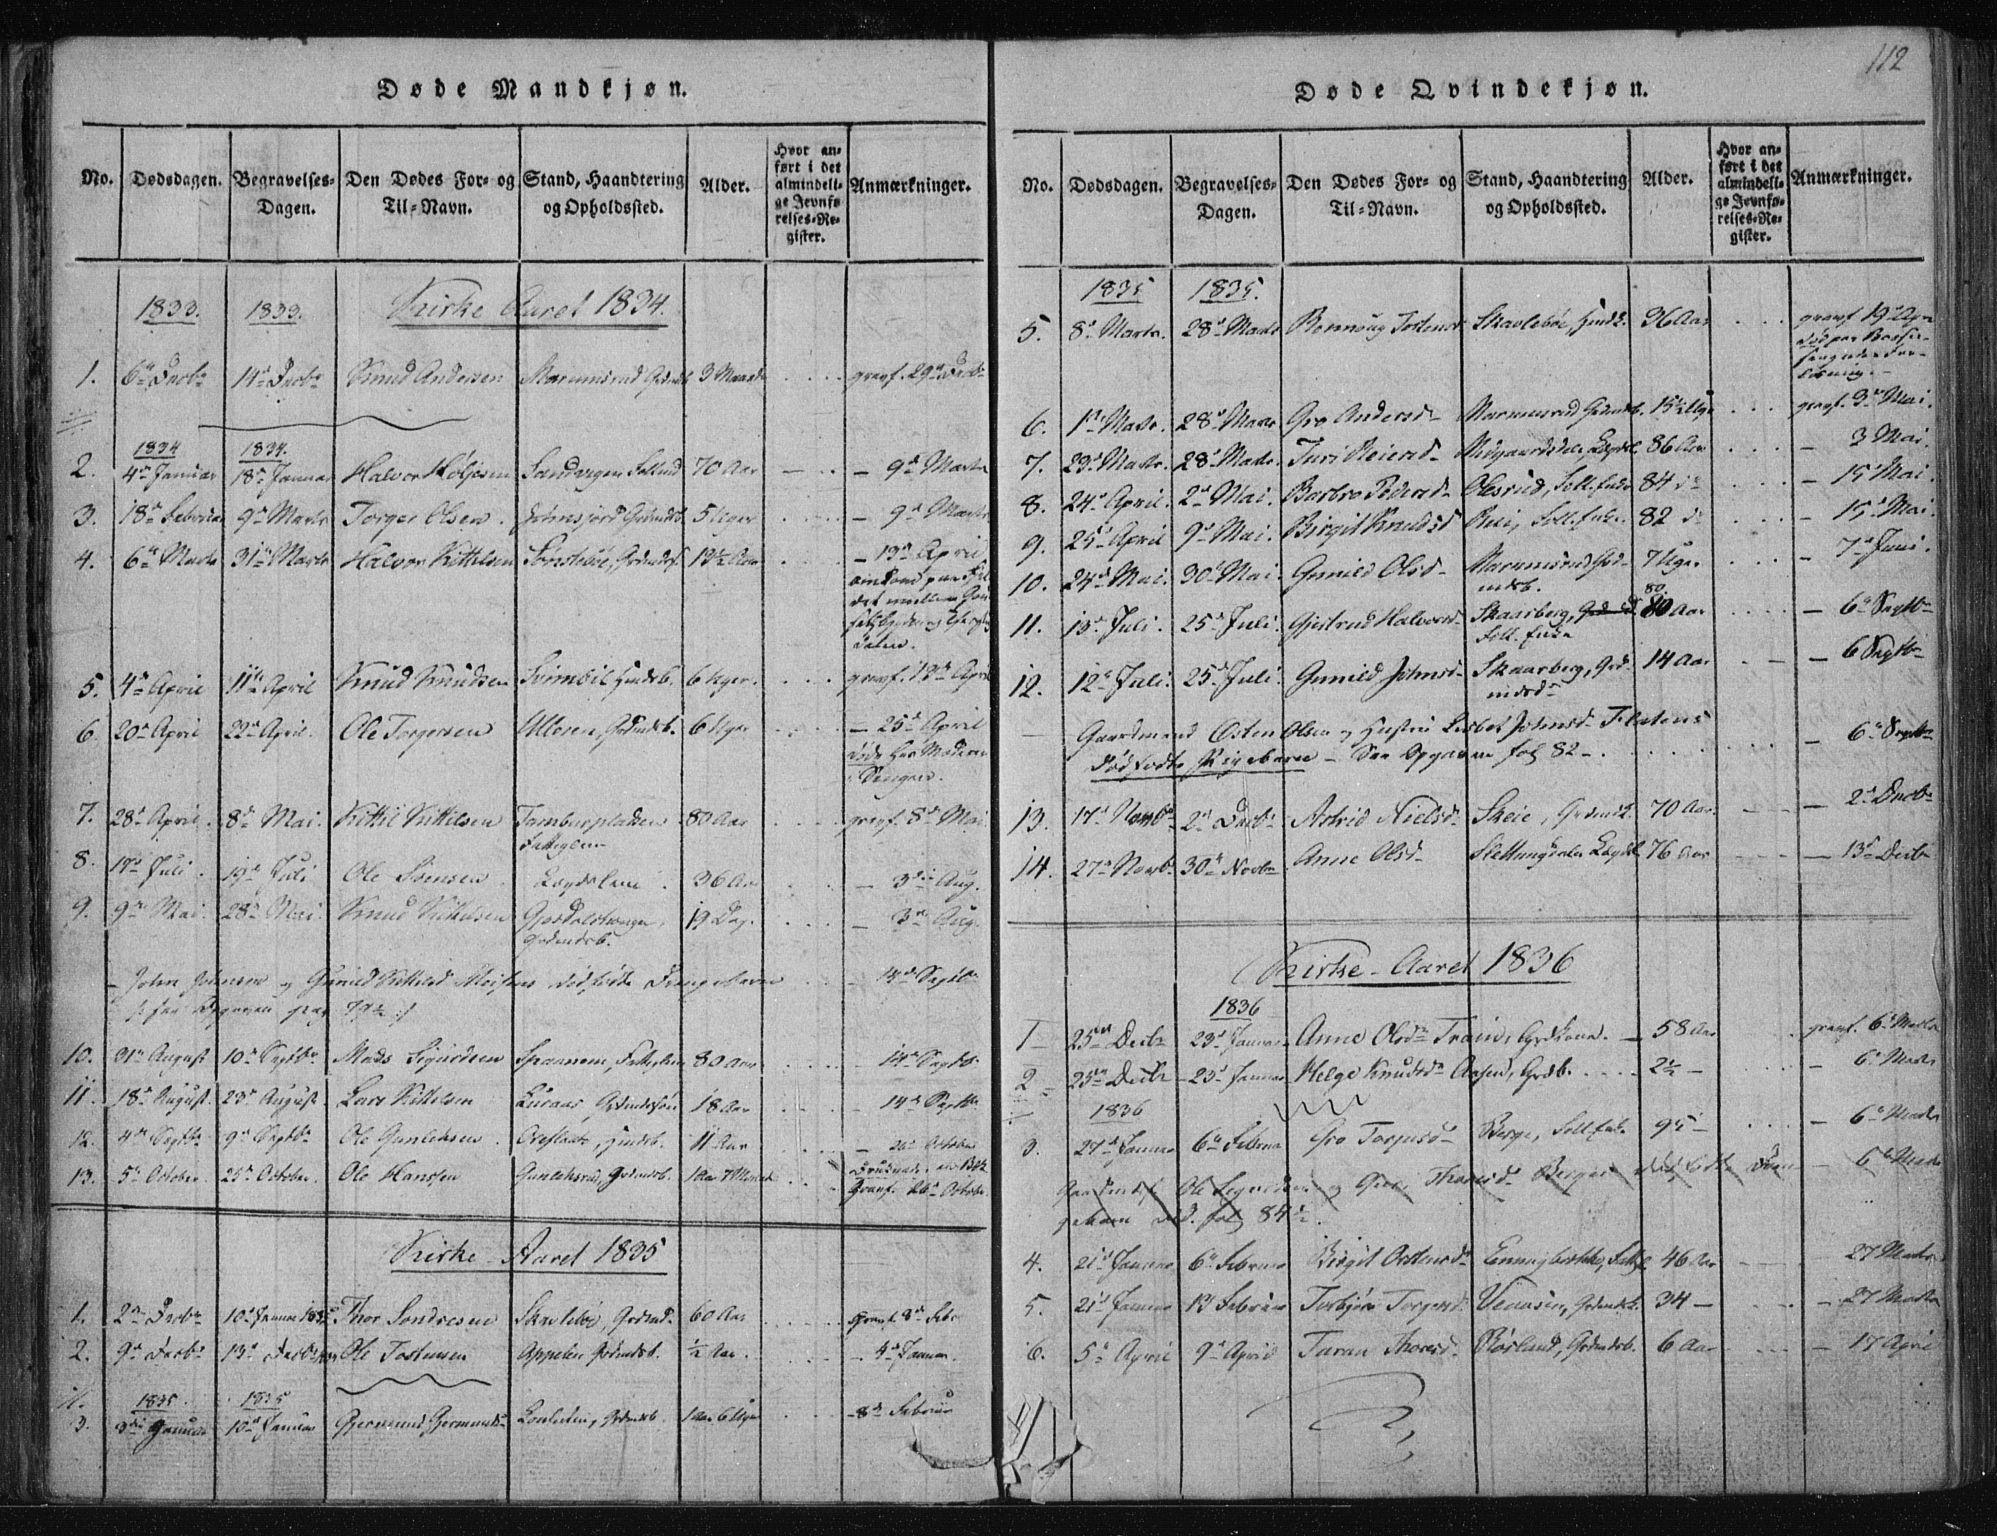 SAKO, Tinn kirkebøker, F/Fa/L0004: Ministerialbok nr. I 4, 1815-1843, s. 112